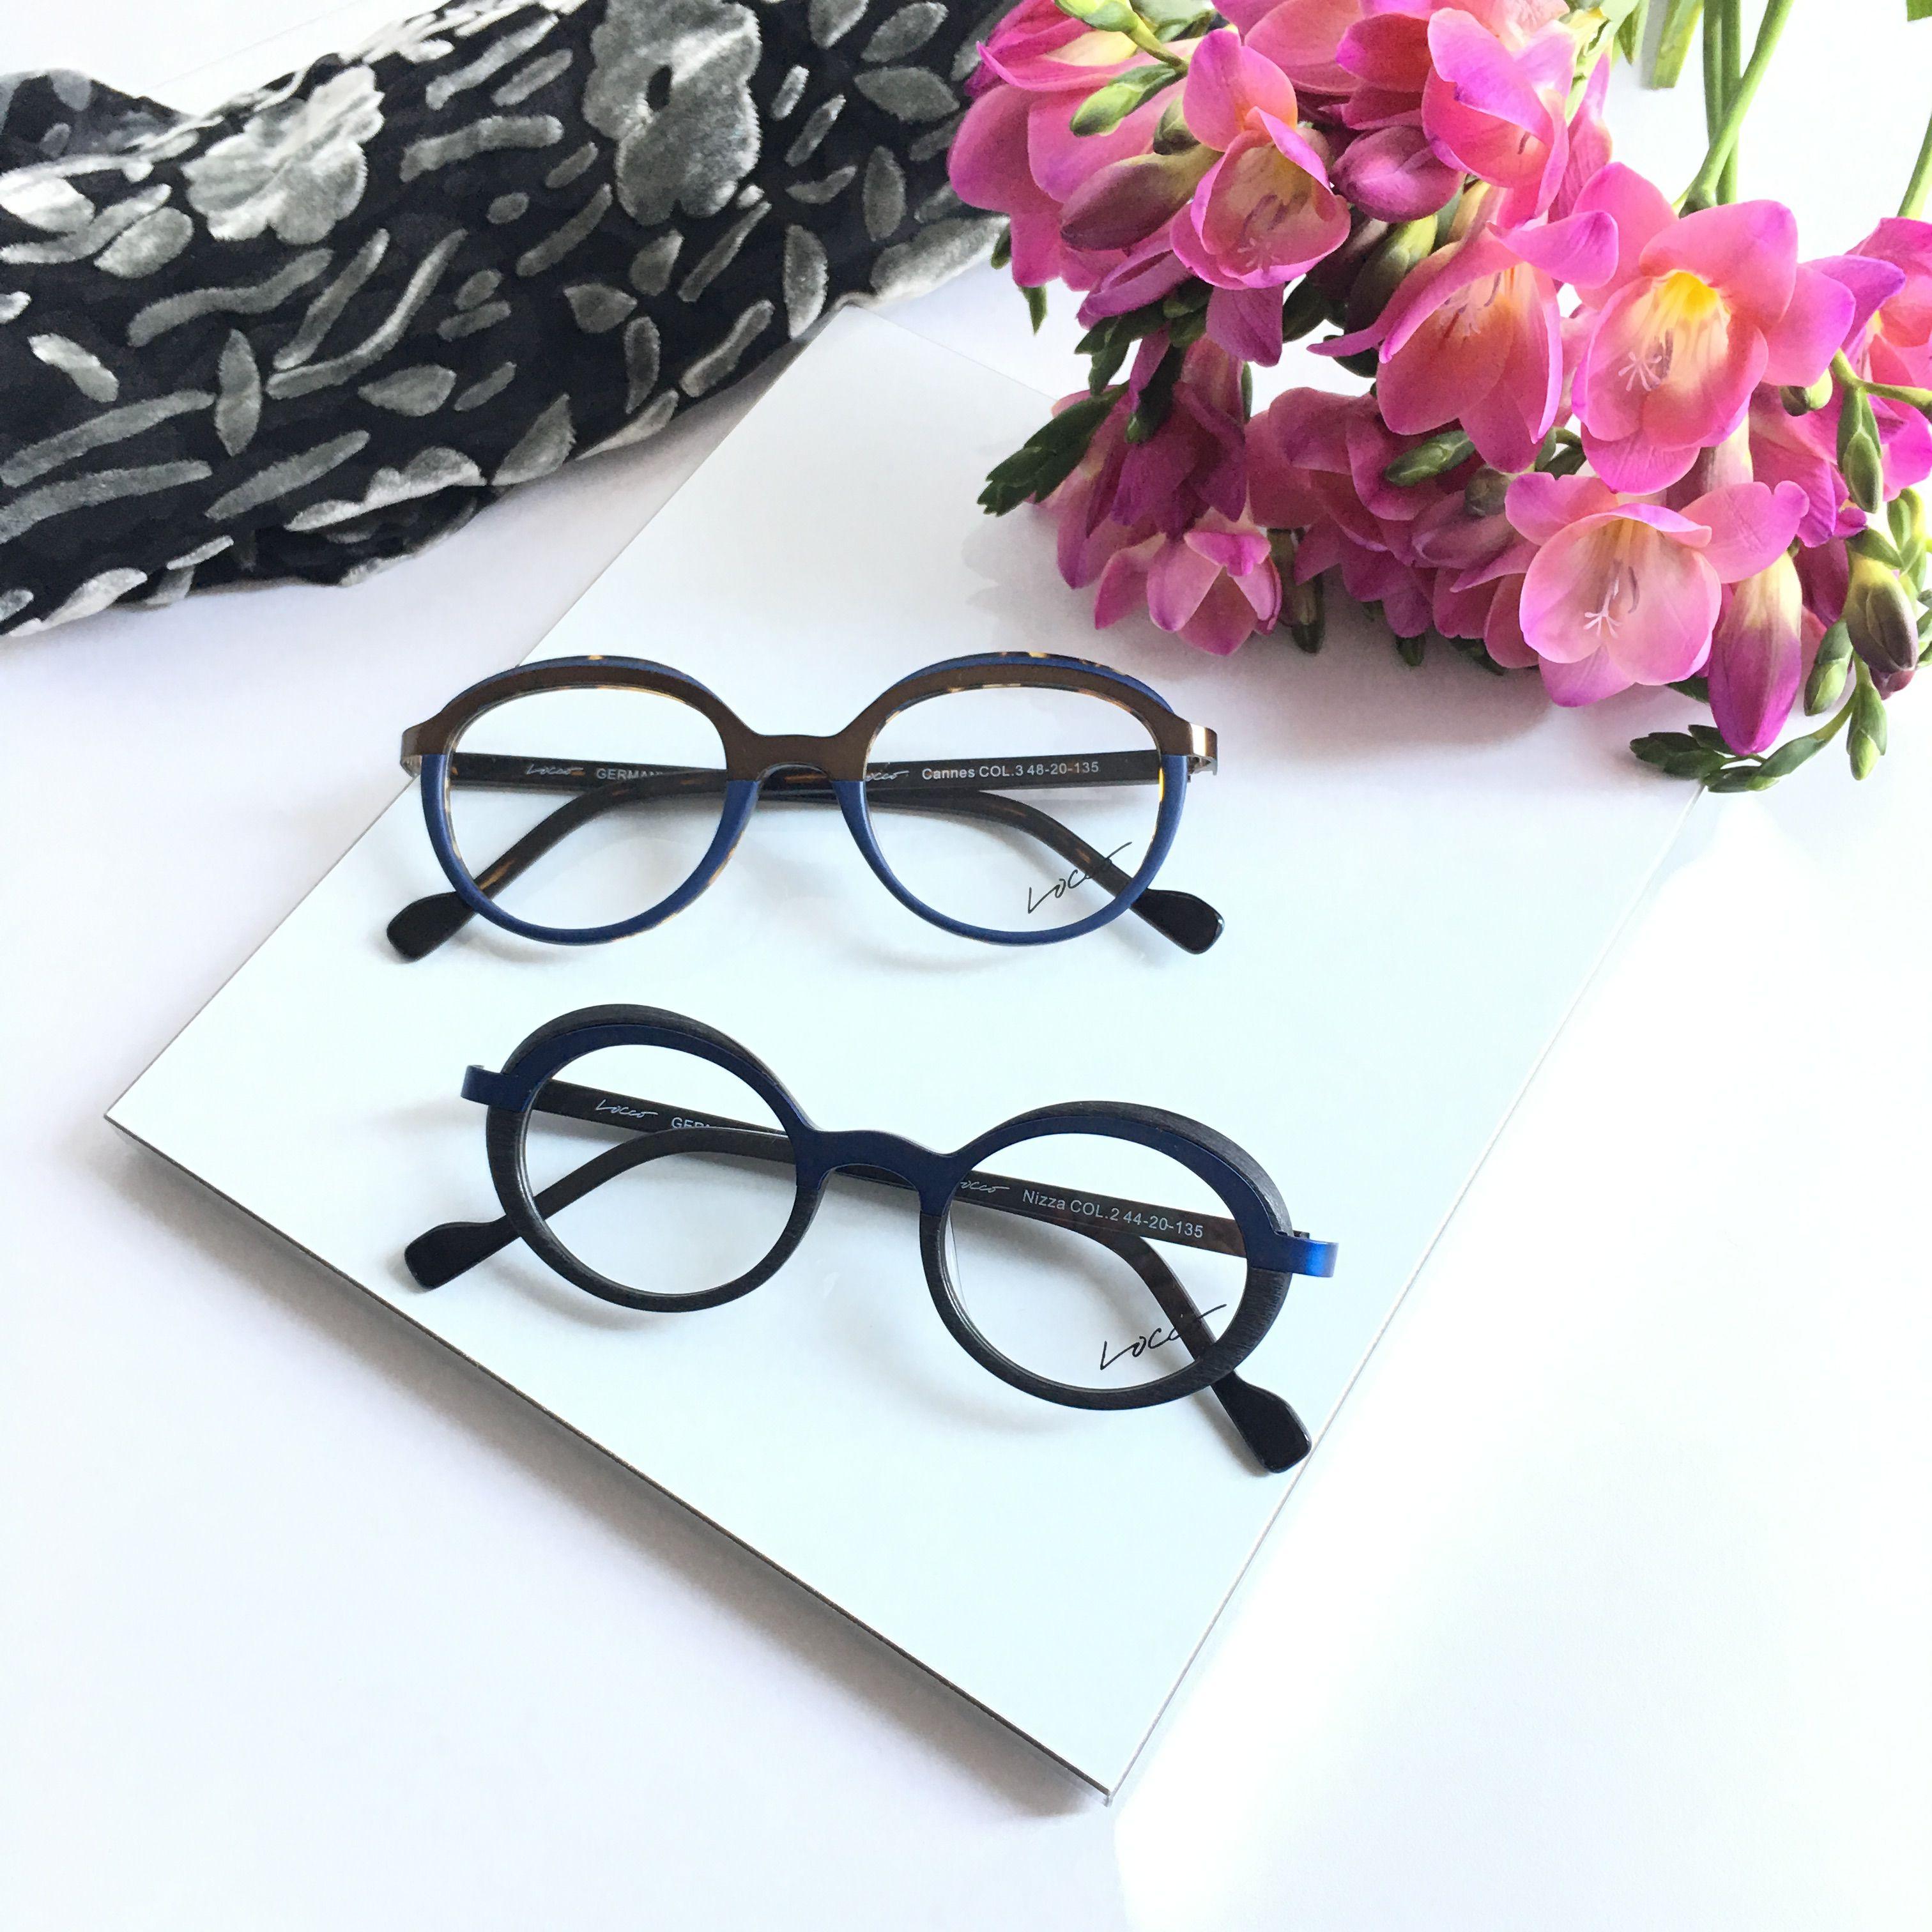 jaguar aviator stock eyeglasses il rimmed eyewear in old fullxfull made p hald new mod vintage frames germany